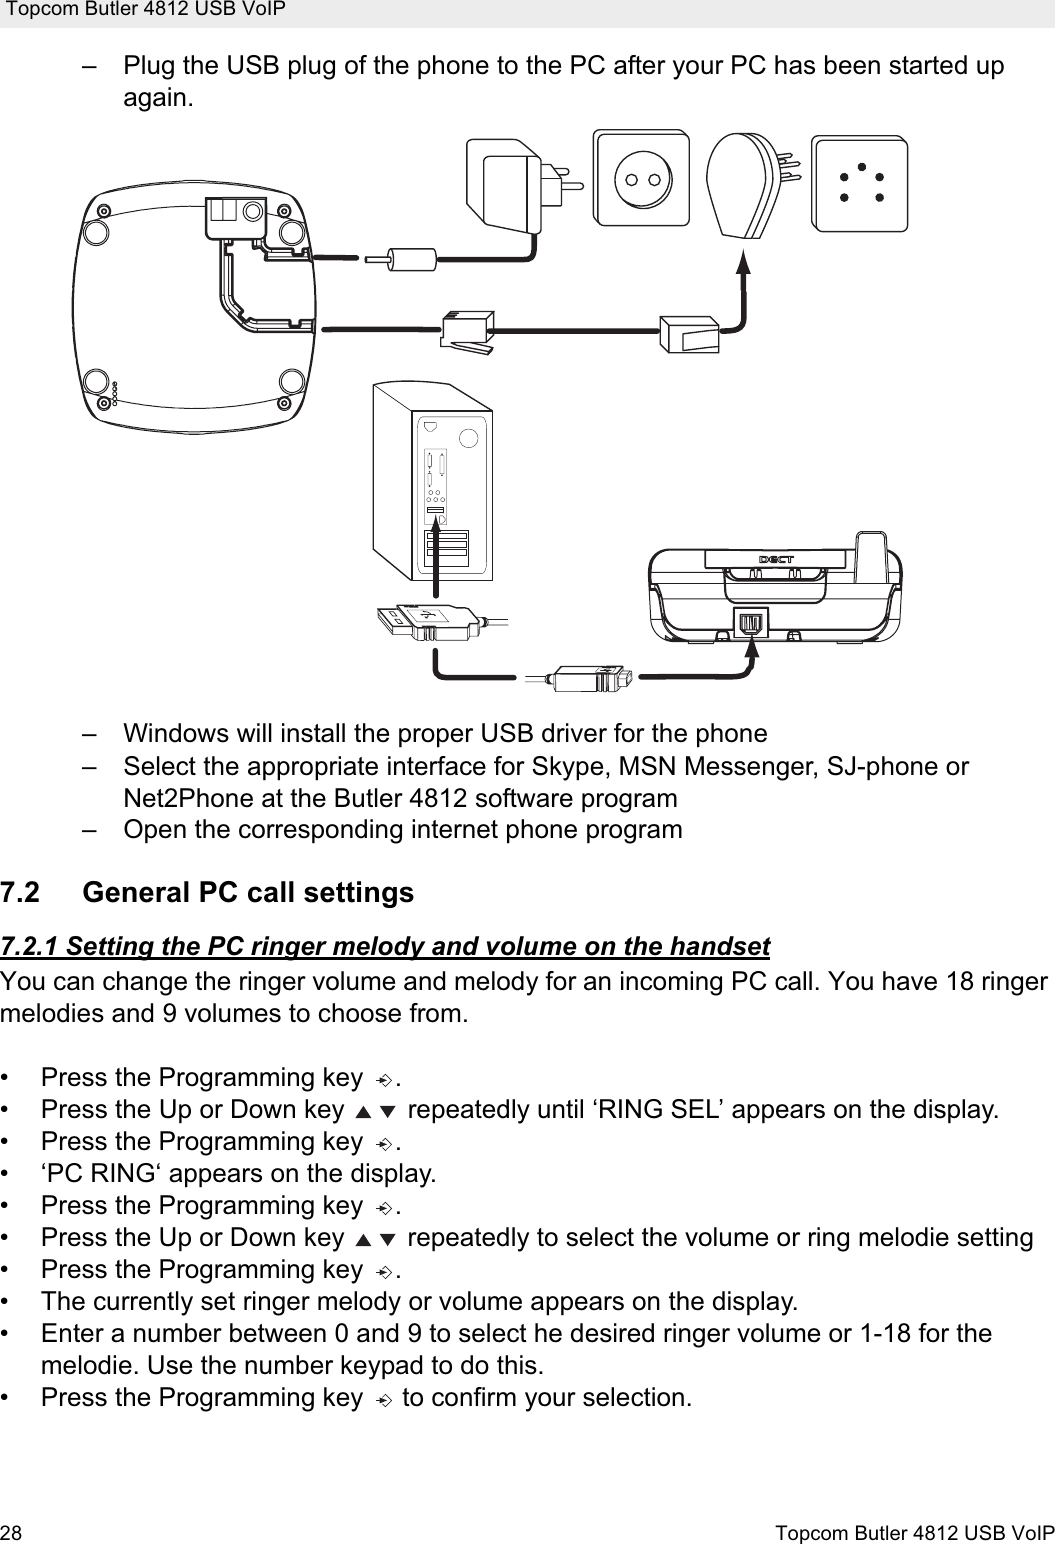 BUTLER 4812 USB VOIP WINDOWS 7 DRIVERS DOWNLOAD (2019)